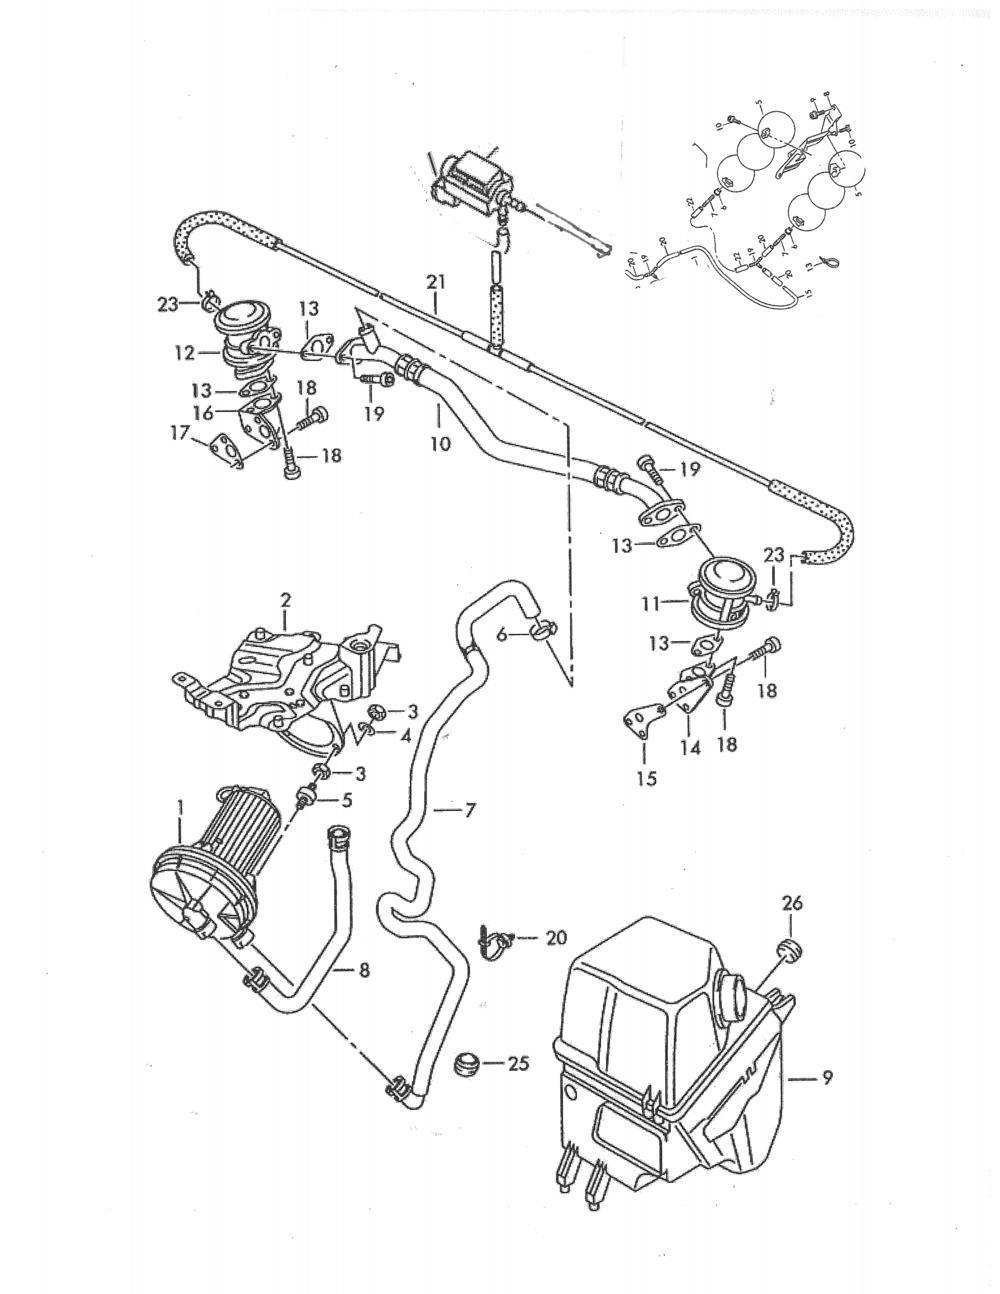 2002 Ford F150 Heater Hose Diagram : heater, diagram, DIAGRAM], Hoses, Diagram, Version, Quality, STITCHDIAGRAMS.TRATTORIADEIBRACCONIERI.IT